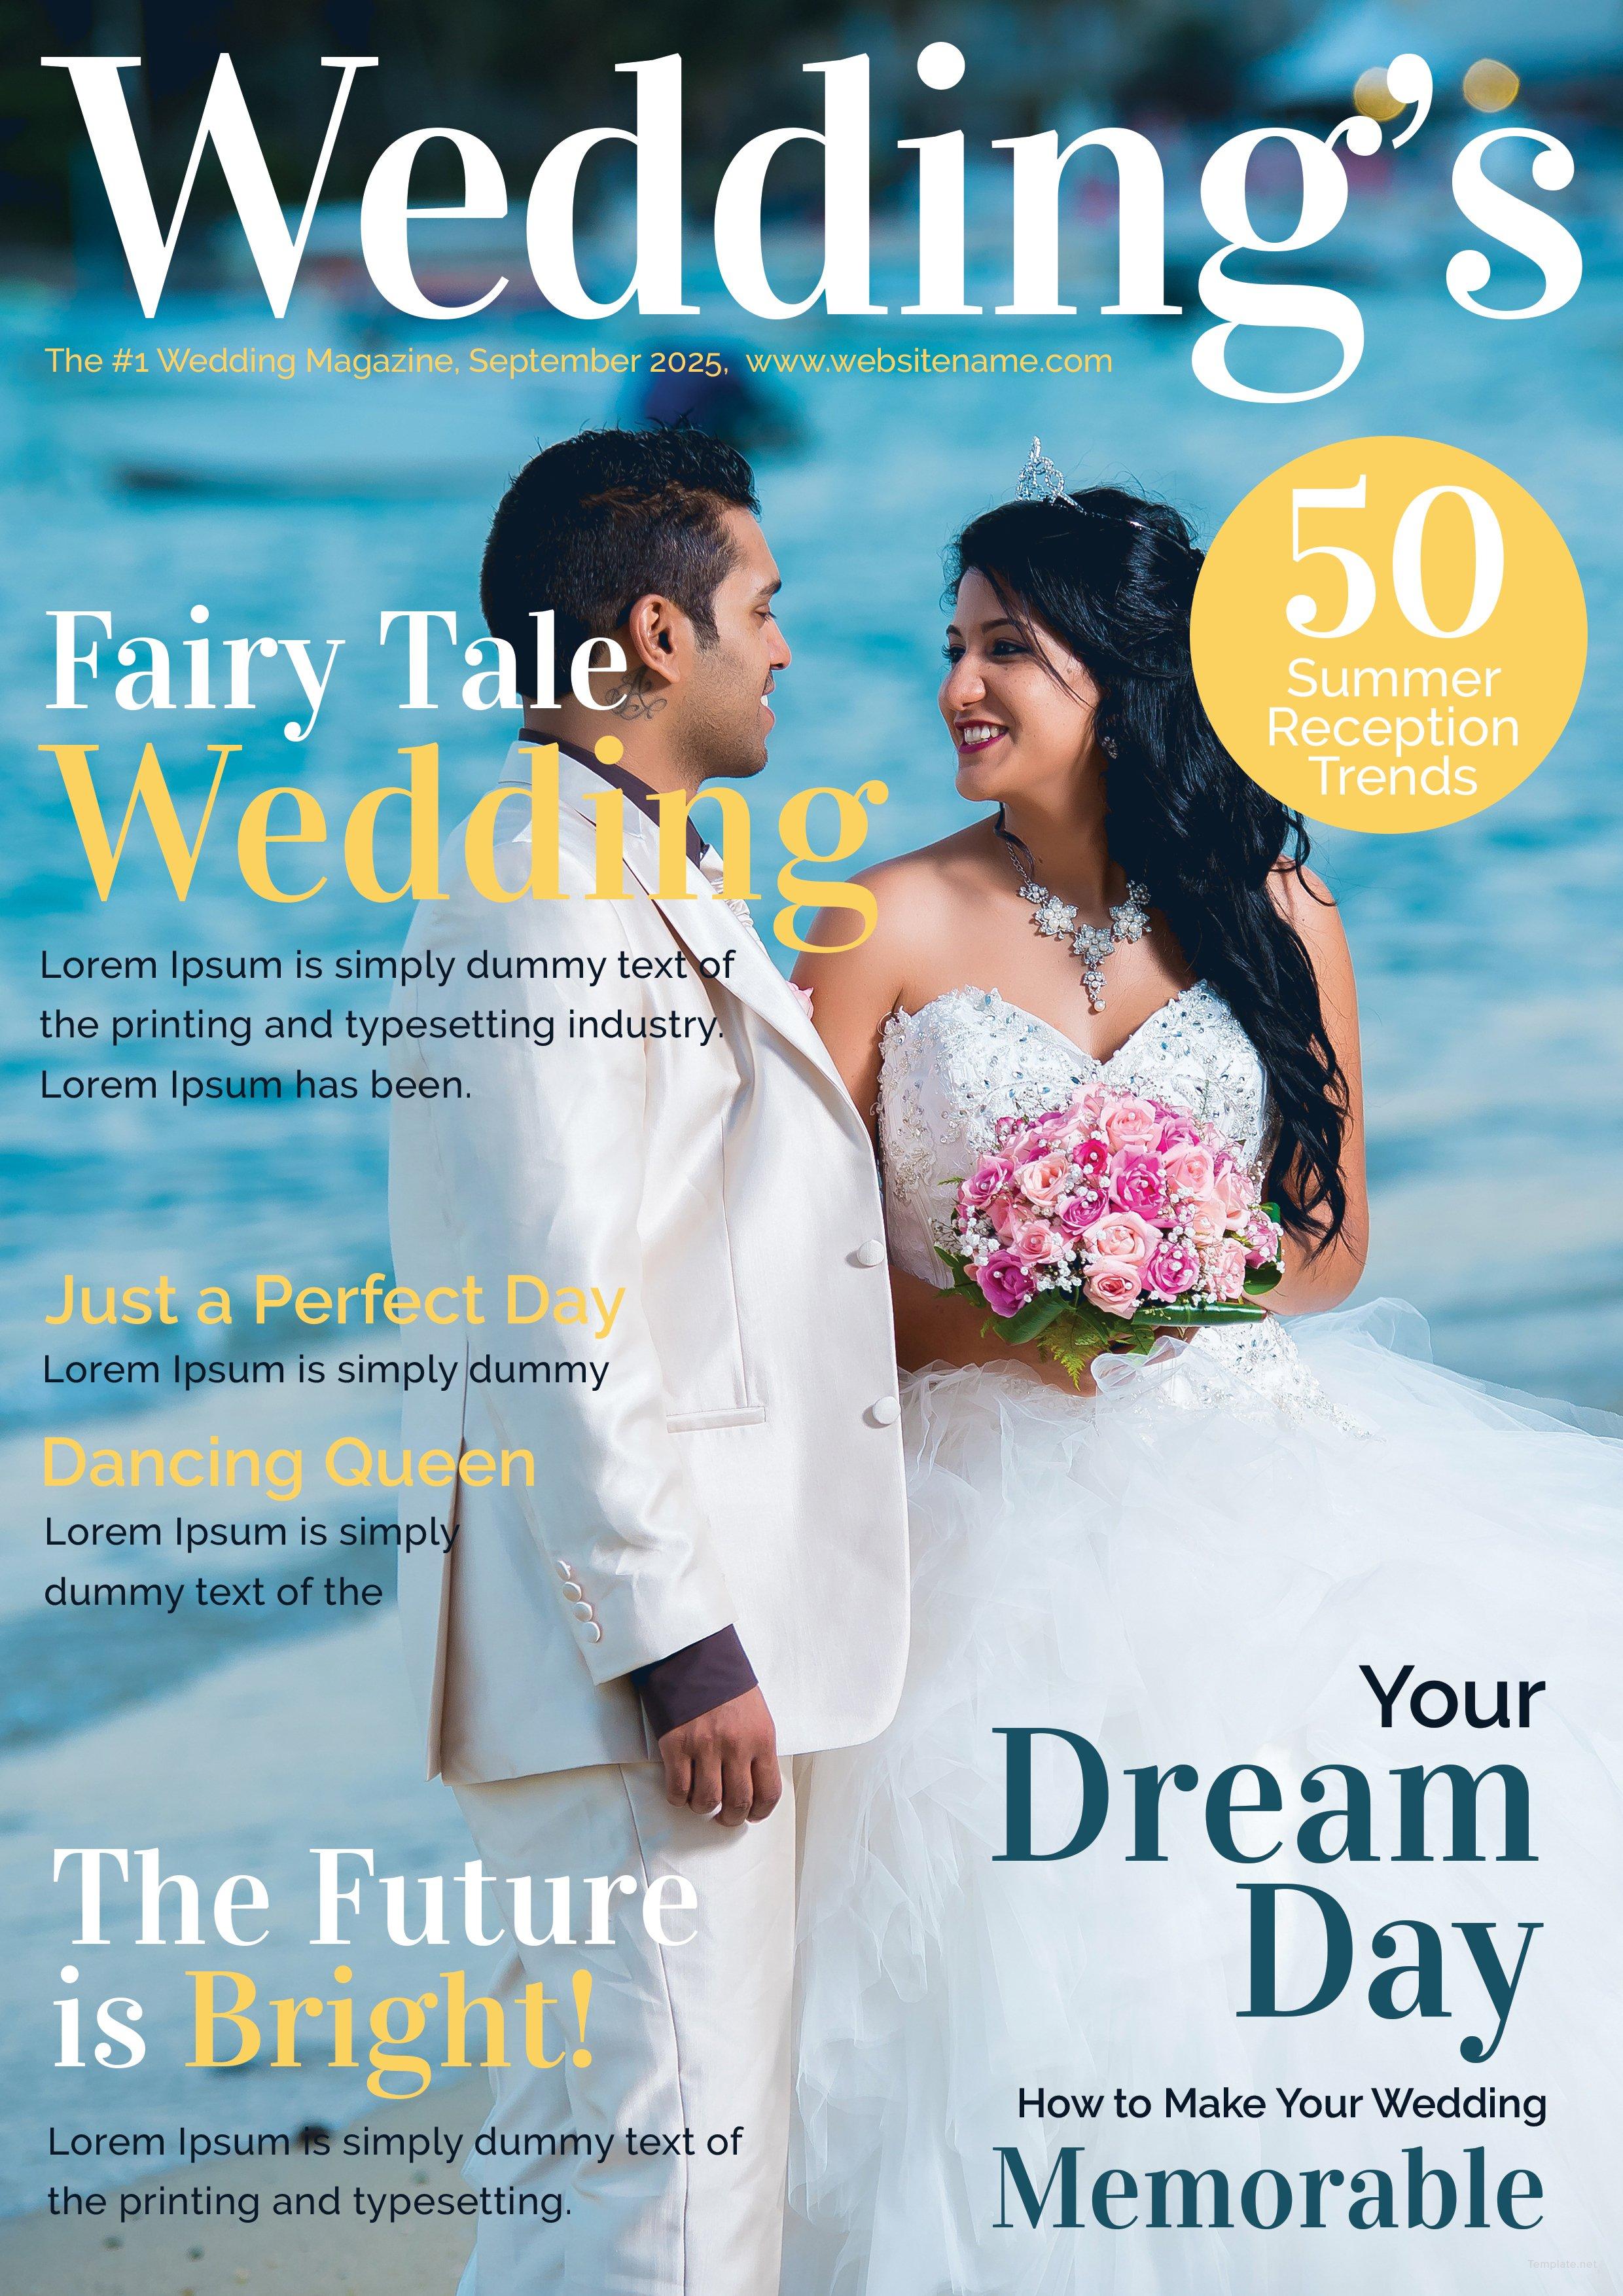 wedding magazine cover template in adobe illustrator